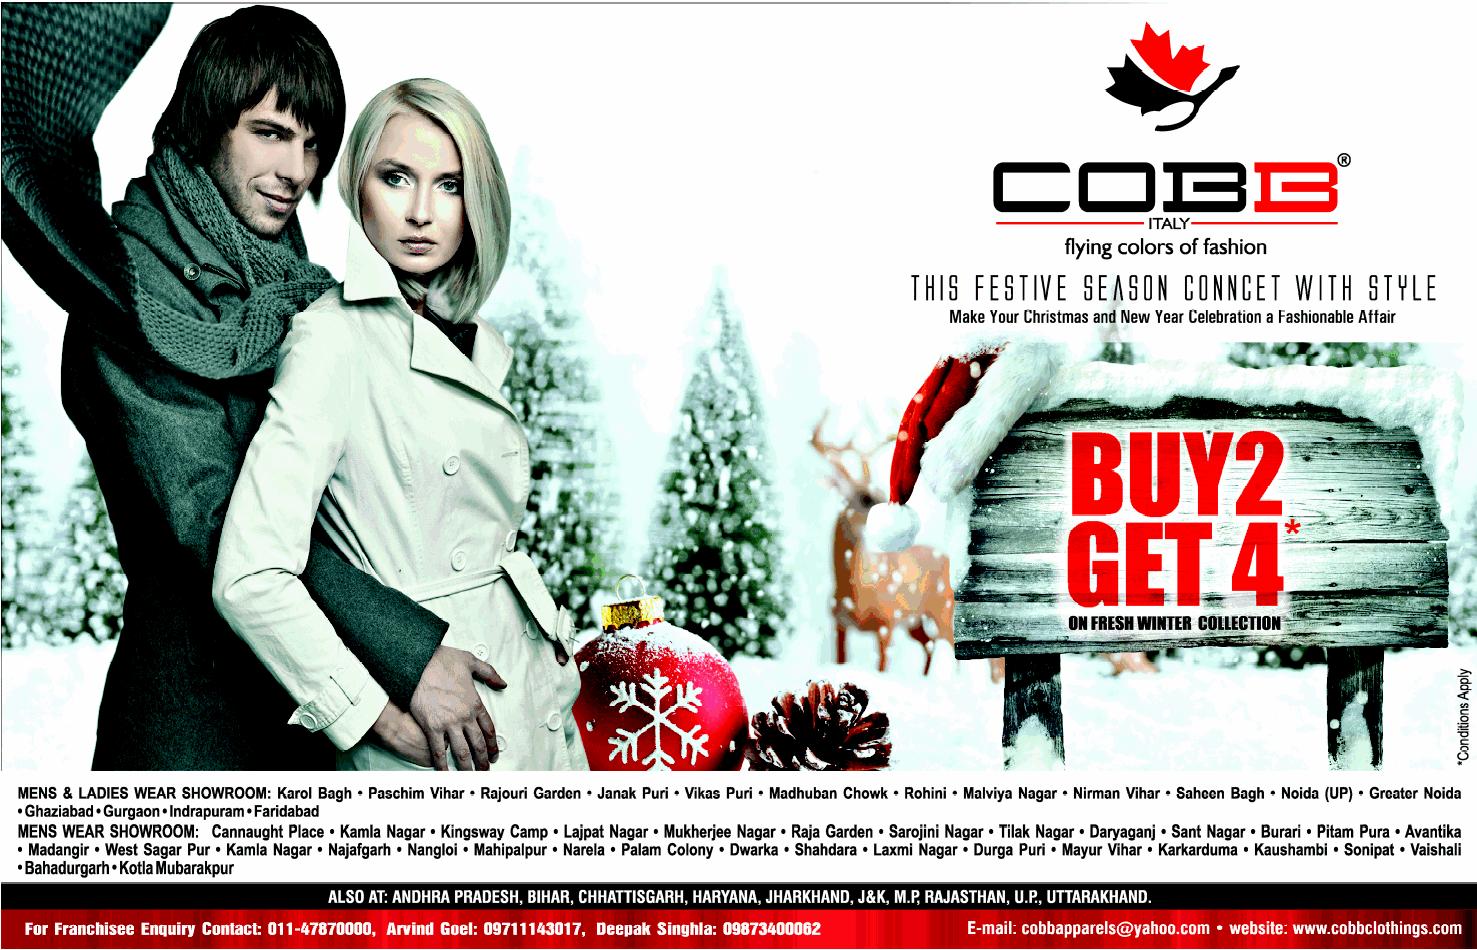 Cobb Italy - BUY 2 Get 4